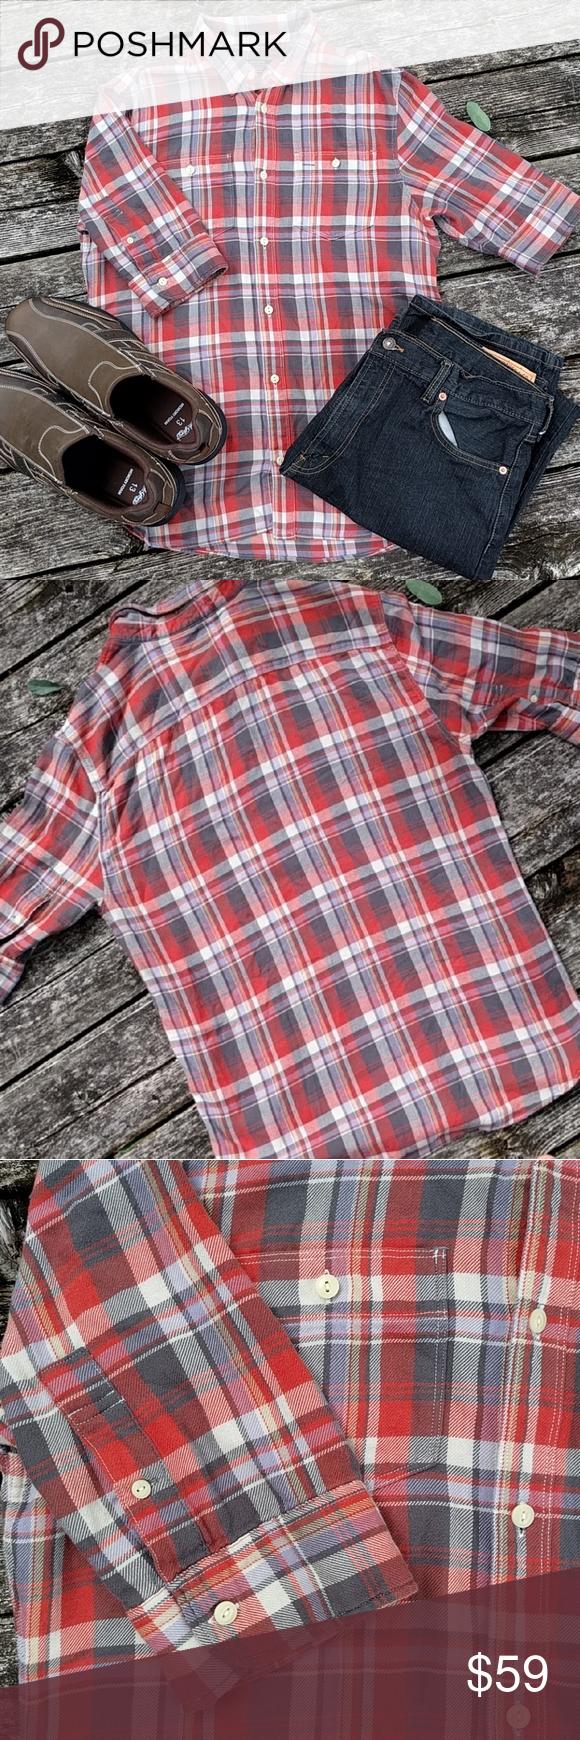 AllSaints Gotland Half Sleeve Plaid Flannel Shirt European